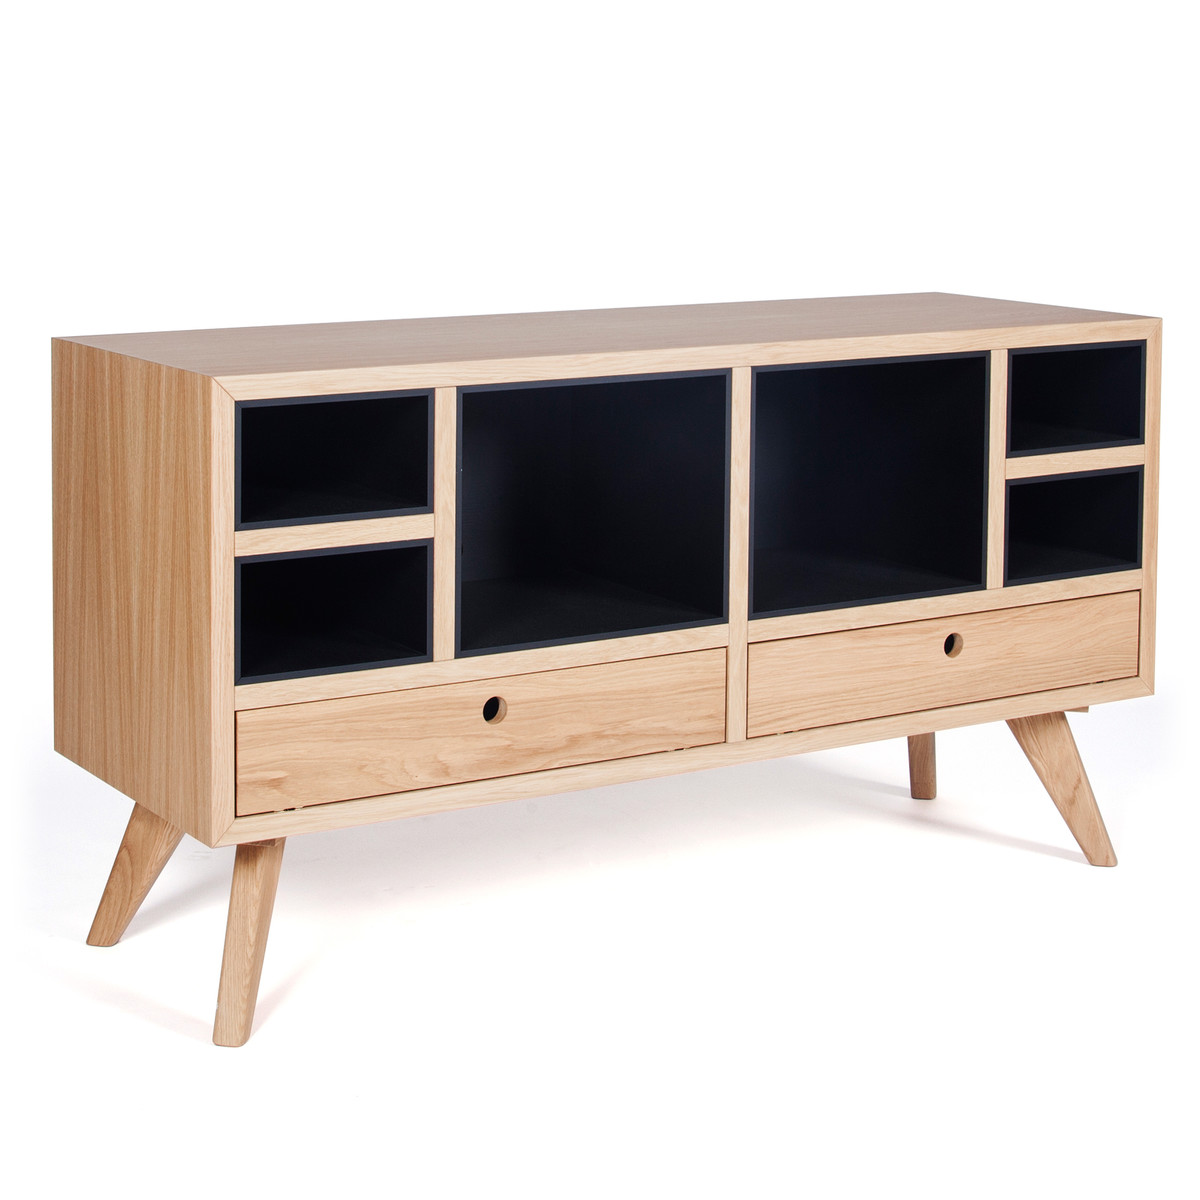 modern retro furniture. Cabinet Tv Scandinavian Modern Retro Furniture V